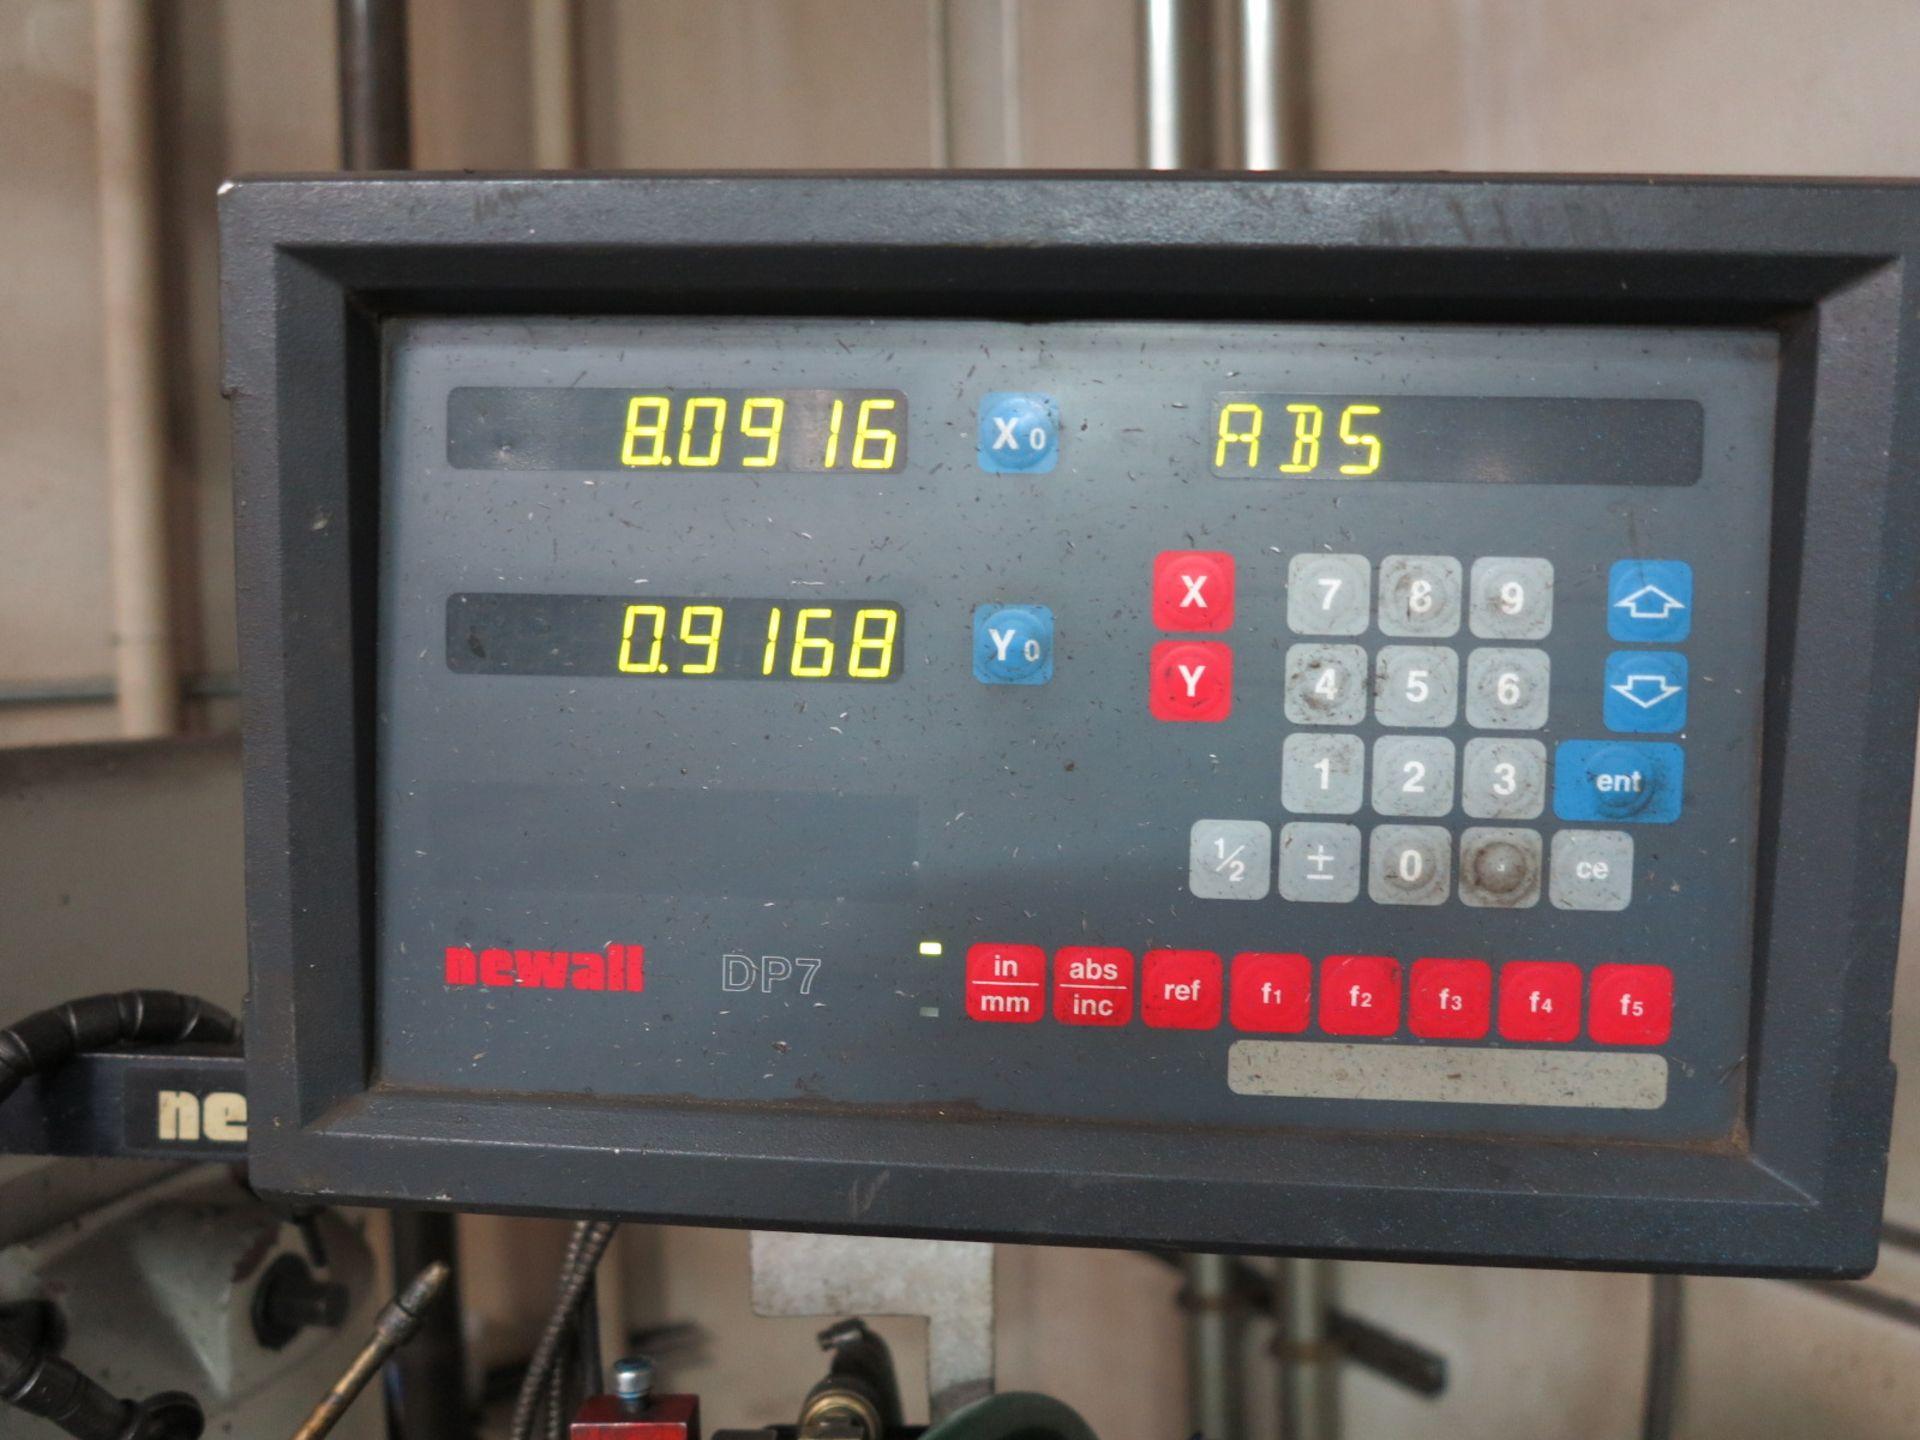 "Lot 5 - ACRA VERTICAL MILL, MODEL A3V, 10"" X 54"" TABLE, POWER FEED, 10"" RAISER BLOCK, NEWALL DRO, 50-3750"